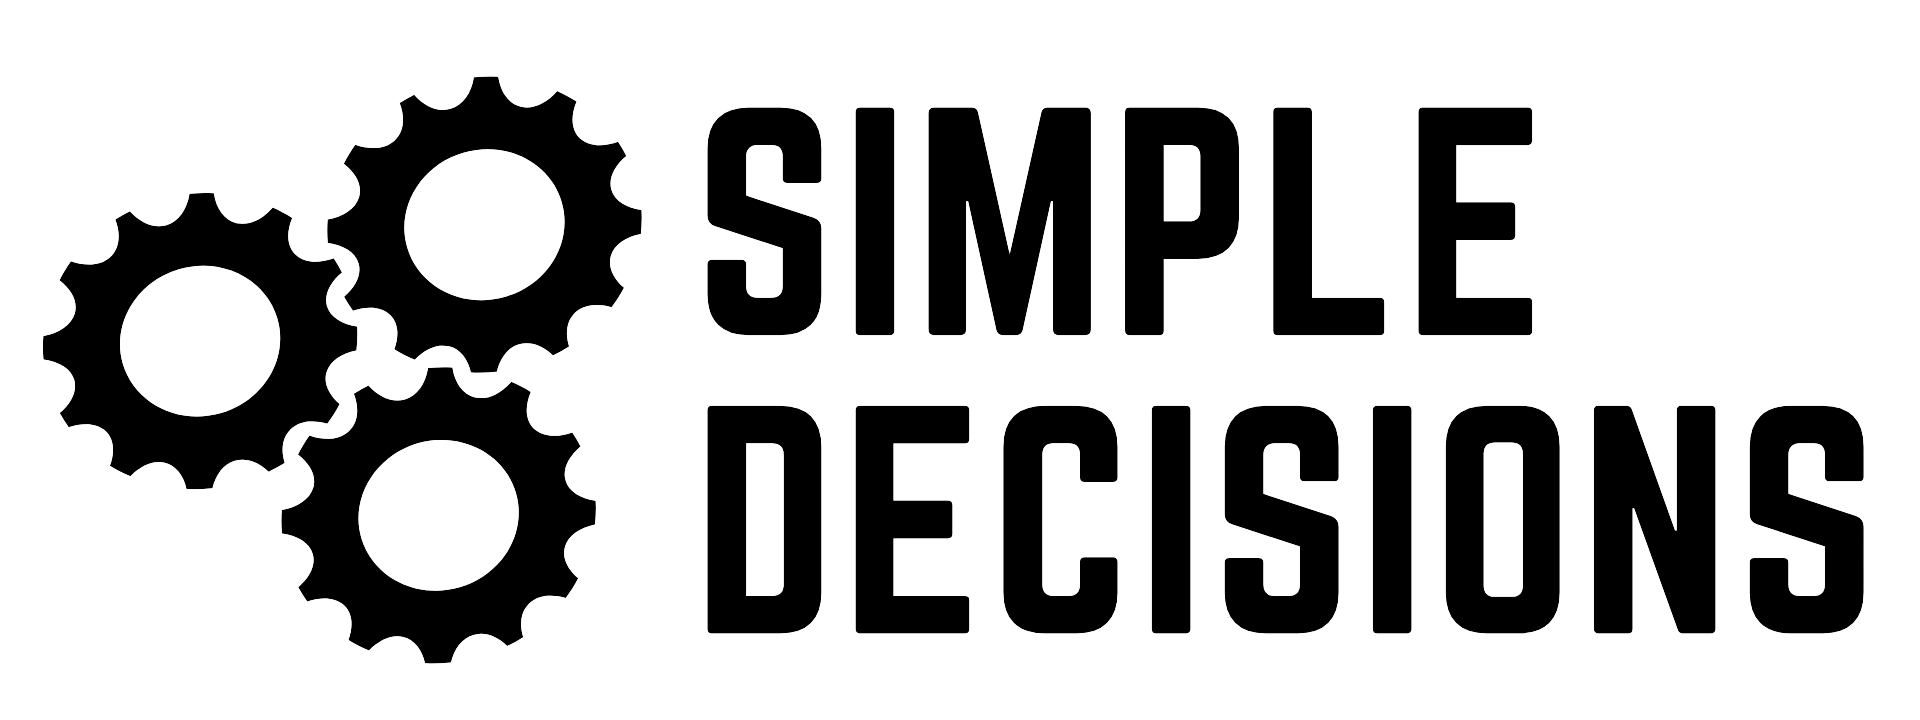 Simple Decisions